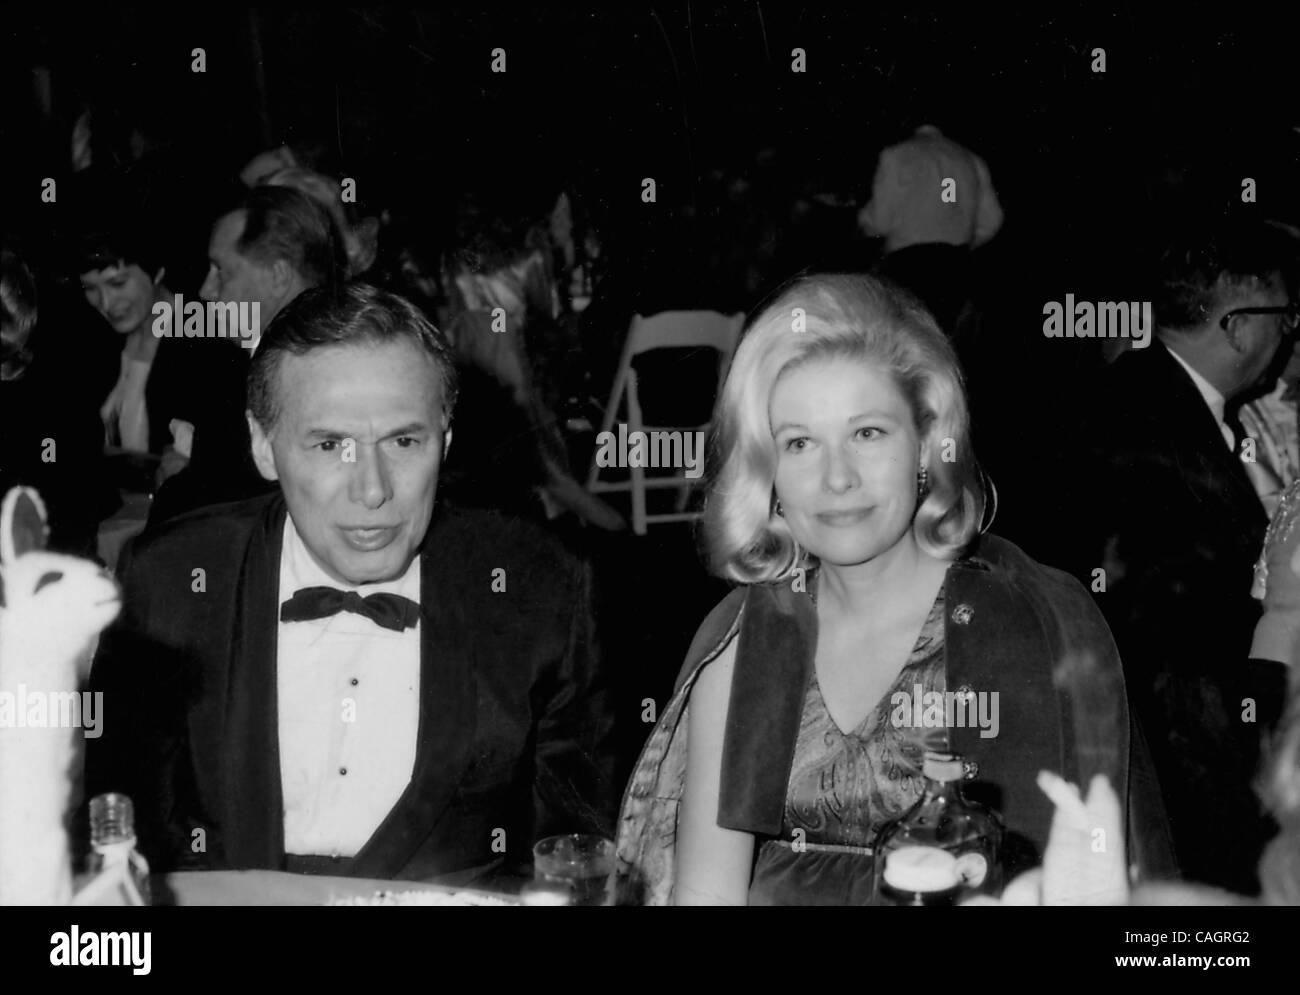 Feb. 4, 2008 - Hollywood, California, U.S. - # 5362.ALAN W. LIVINGSTON WITH NANCY OLSEN.'' DOLITTLE '' 1967.(Credit Stock Photo